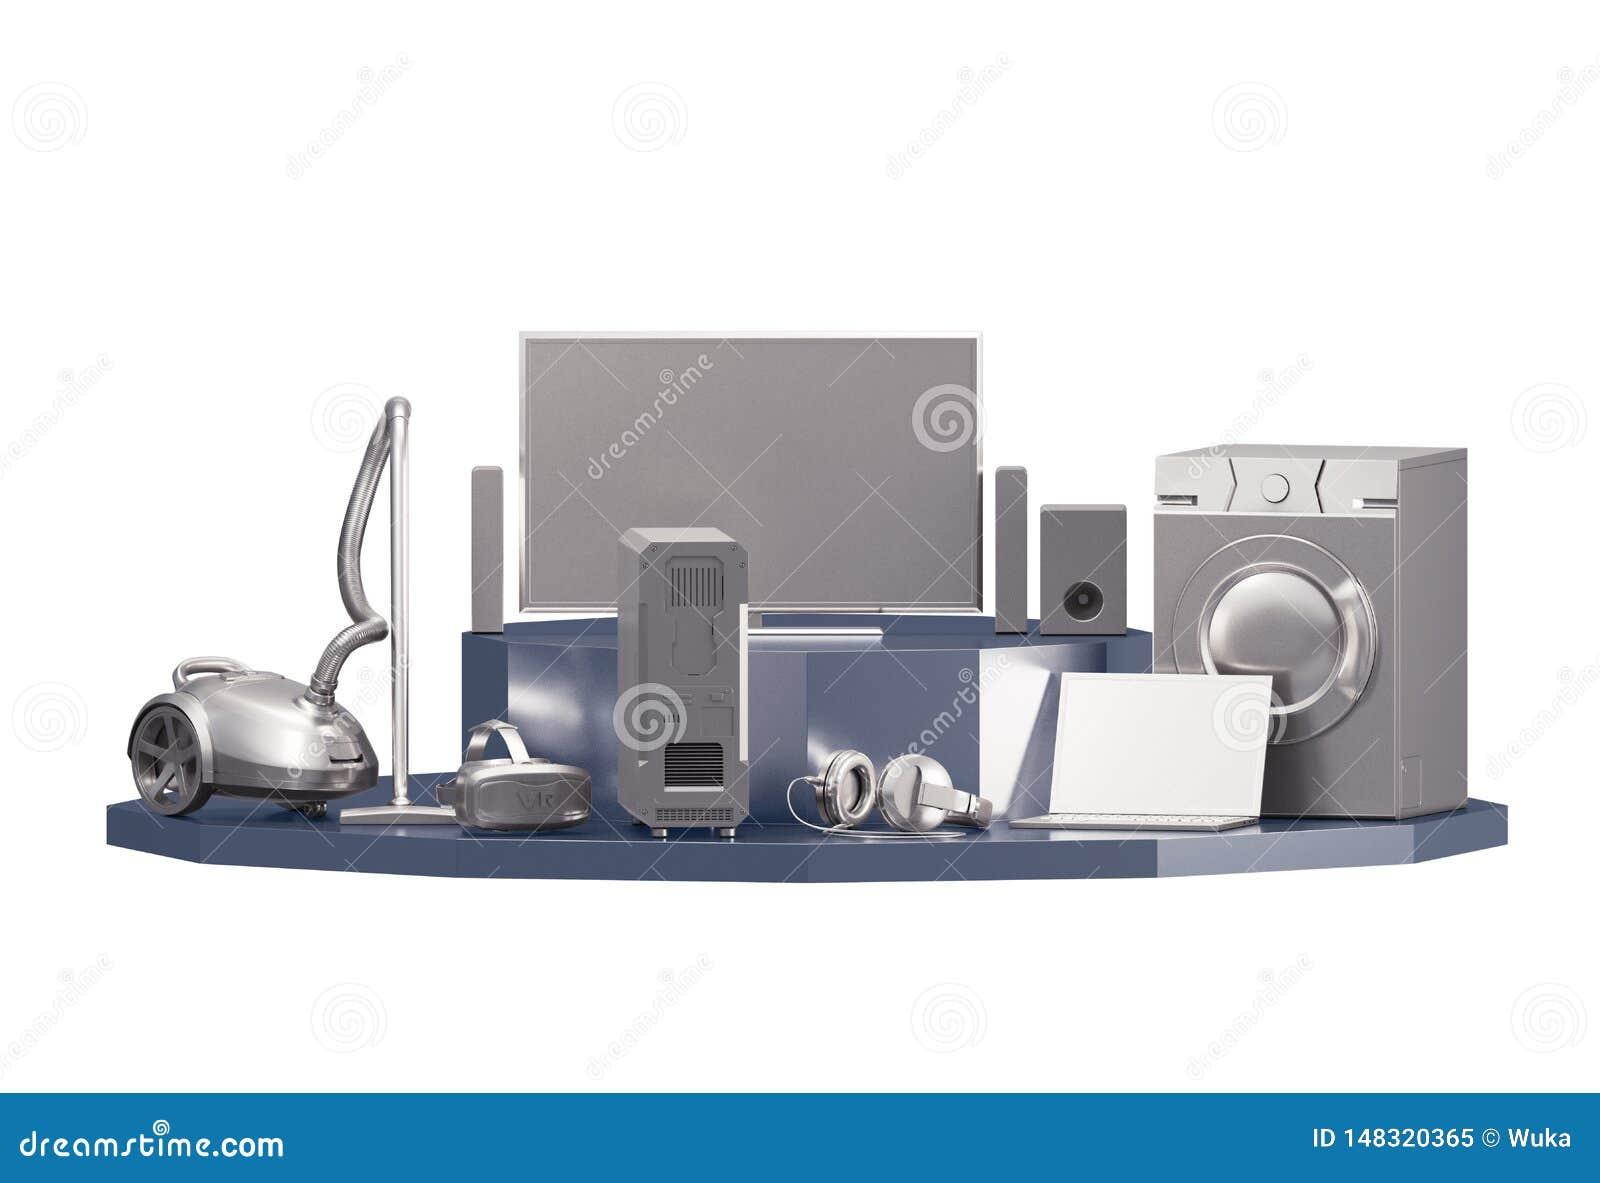 Set of Home Appliances / Electronics on White